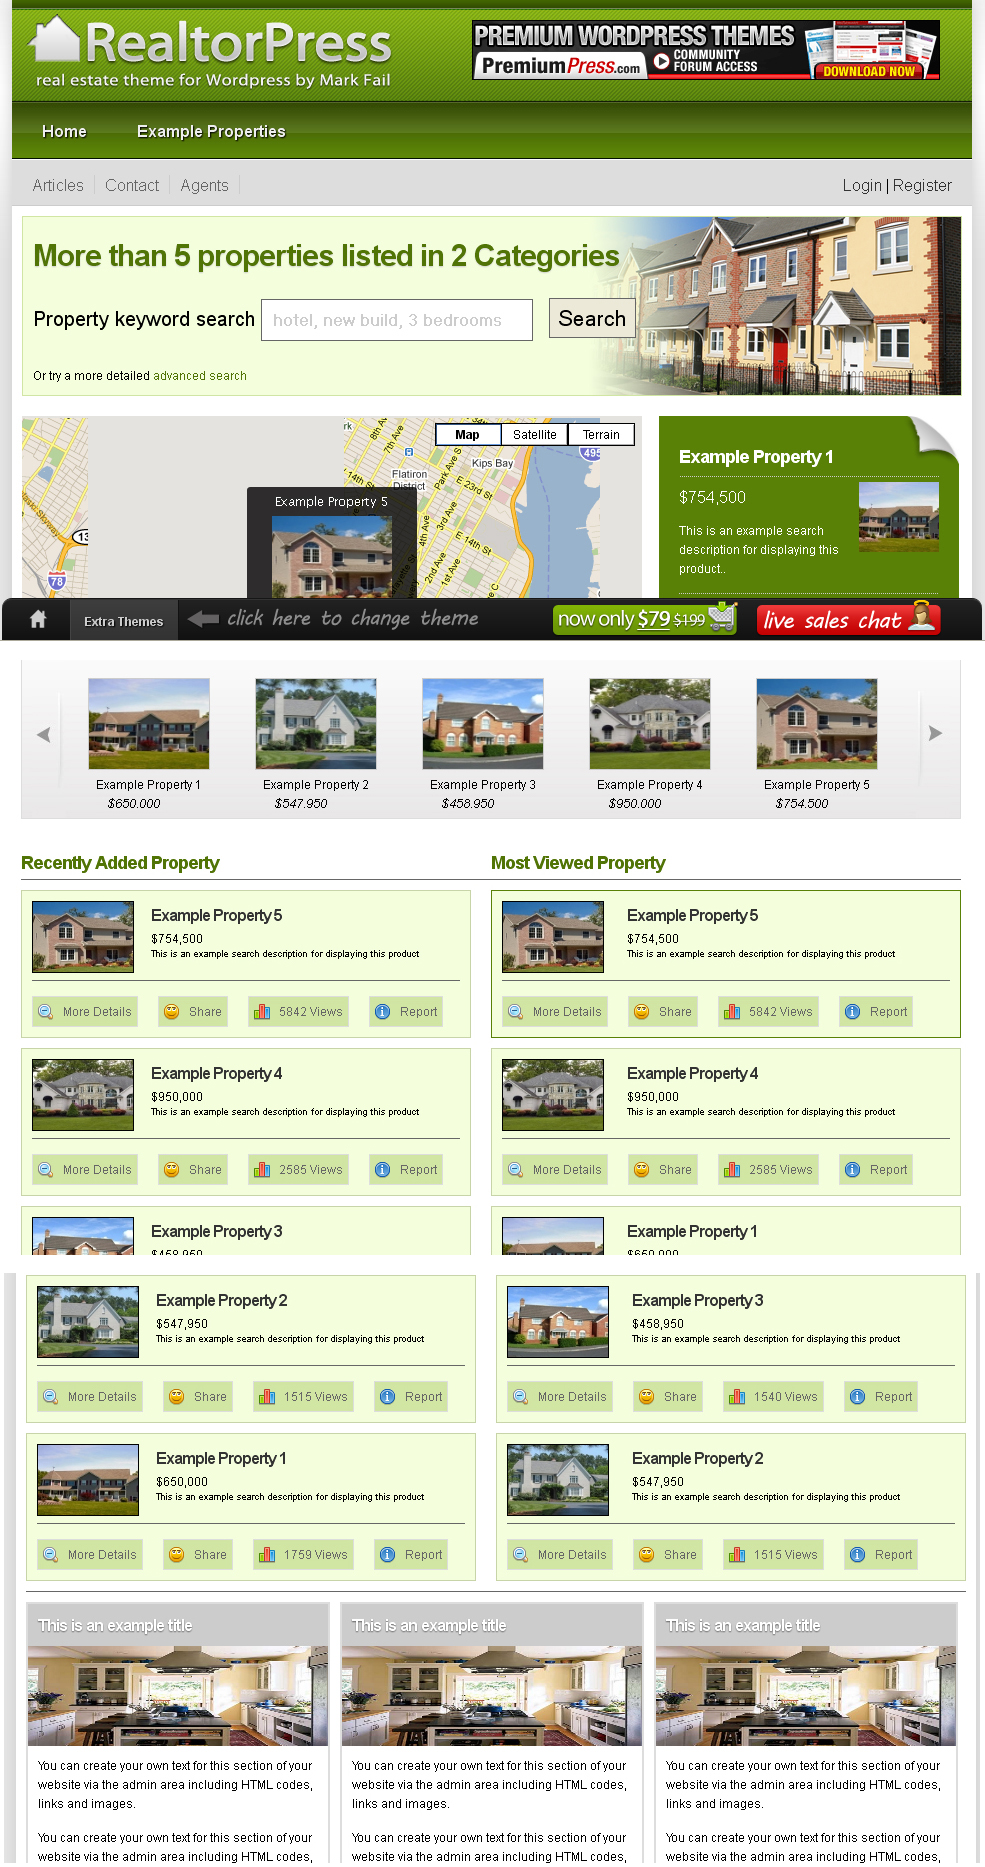 Real Estate Theme for Wordpress Screenshot